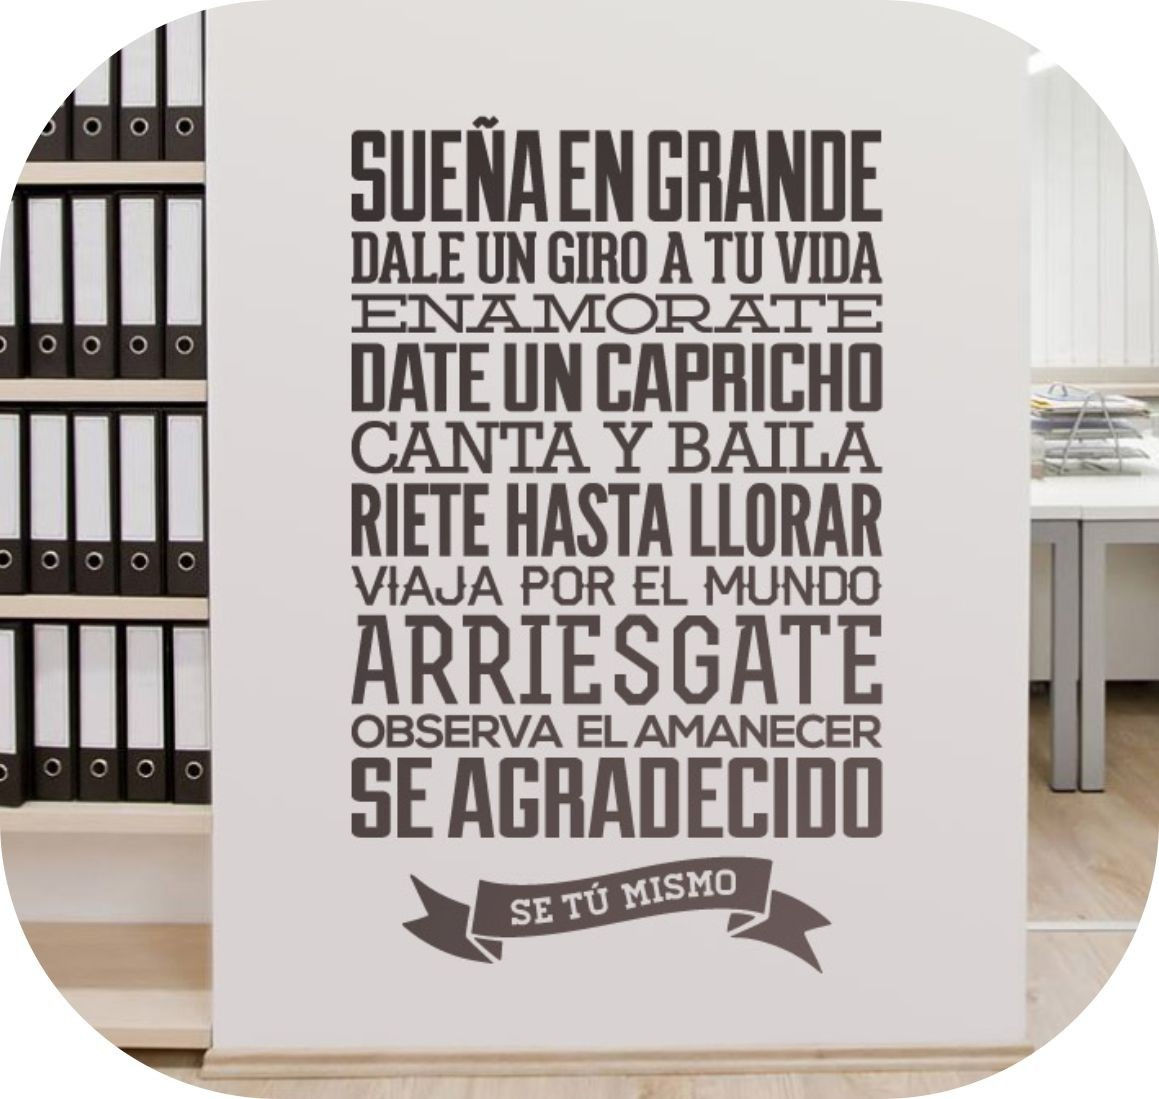 Vinilos decorativos textos y frases celebres rotulados for Vinilos pared frases